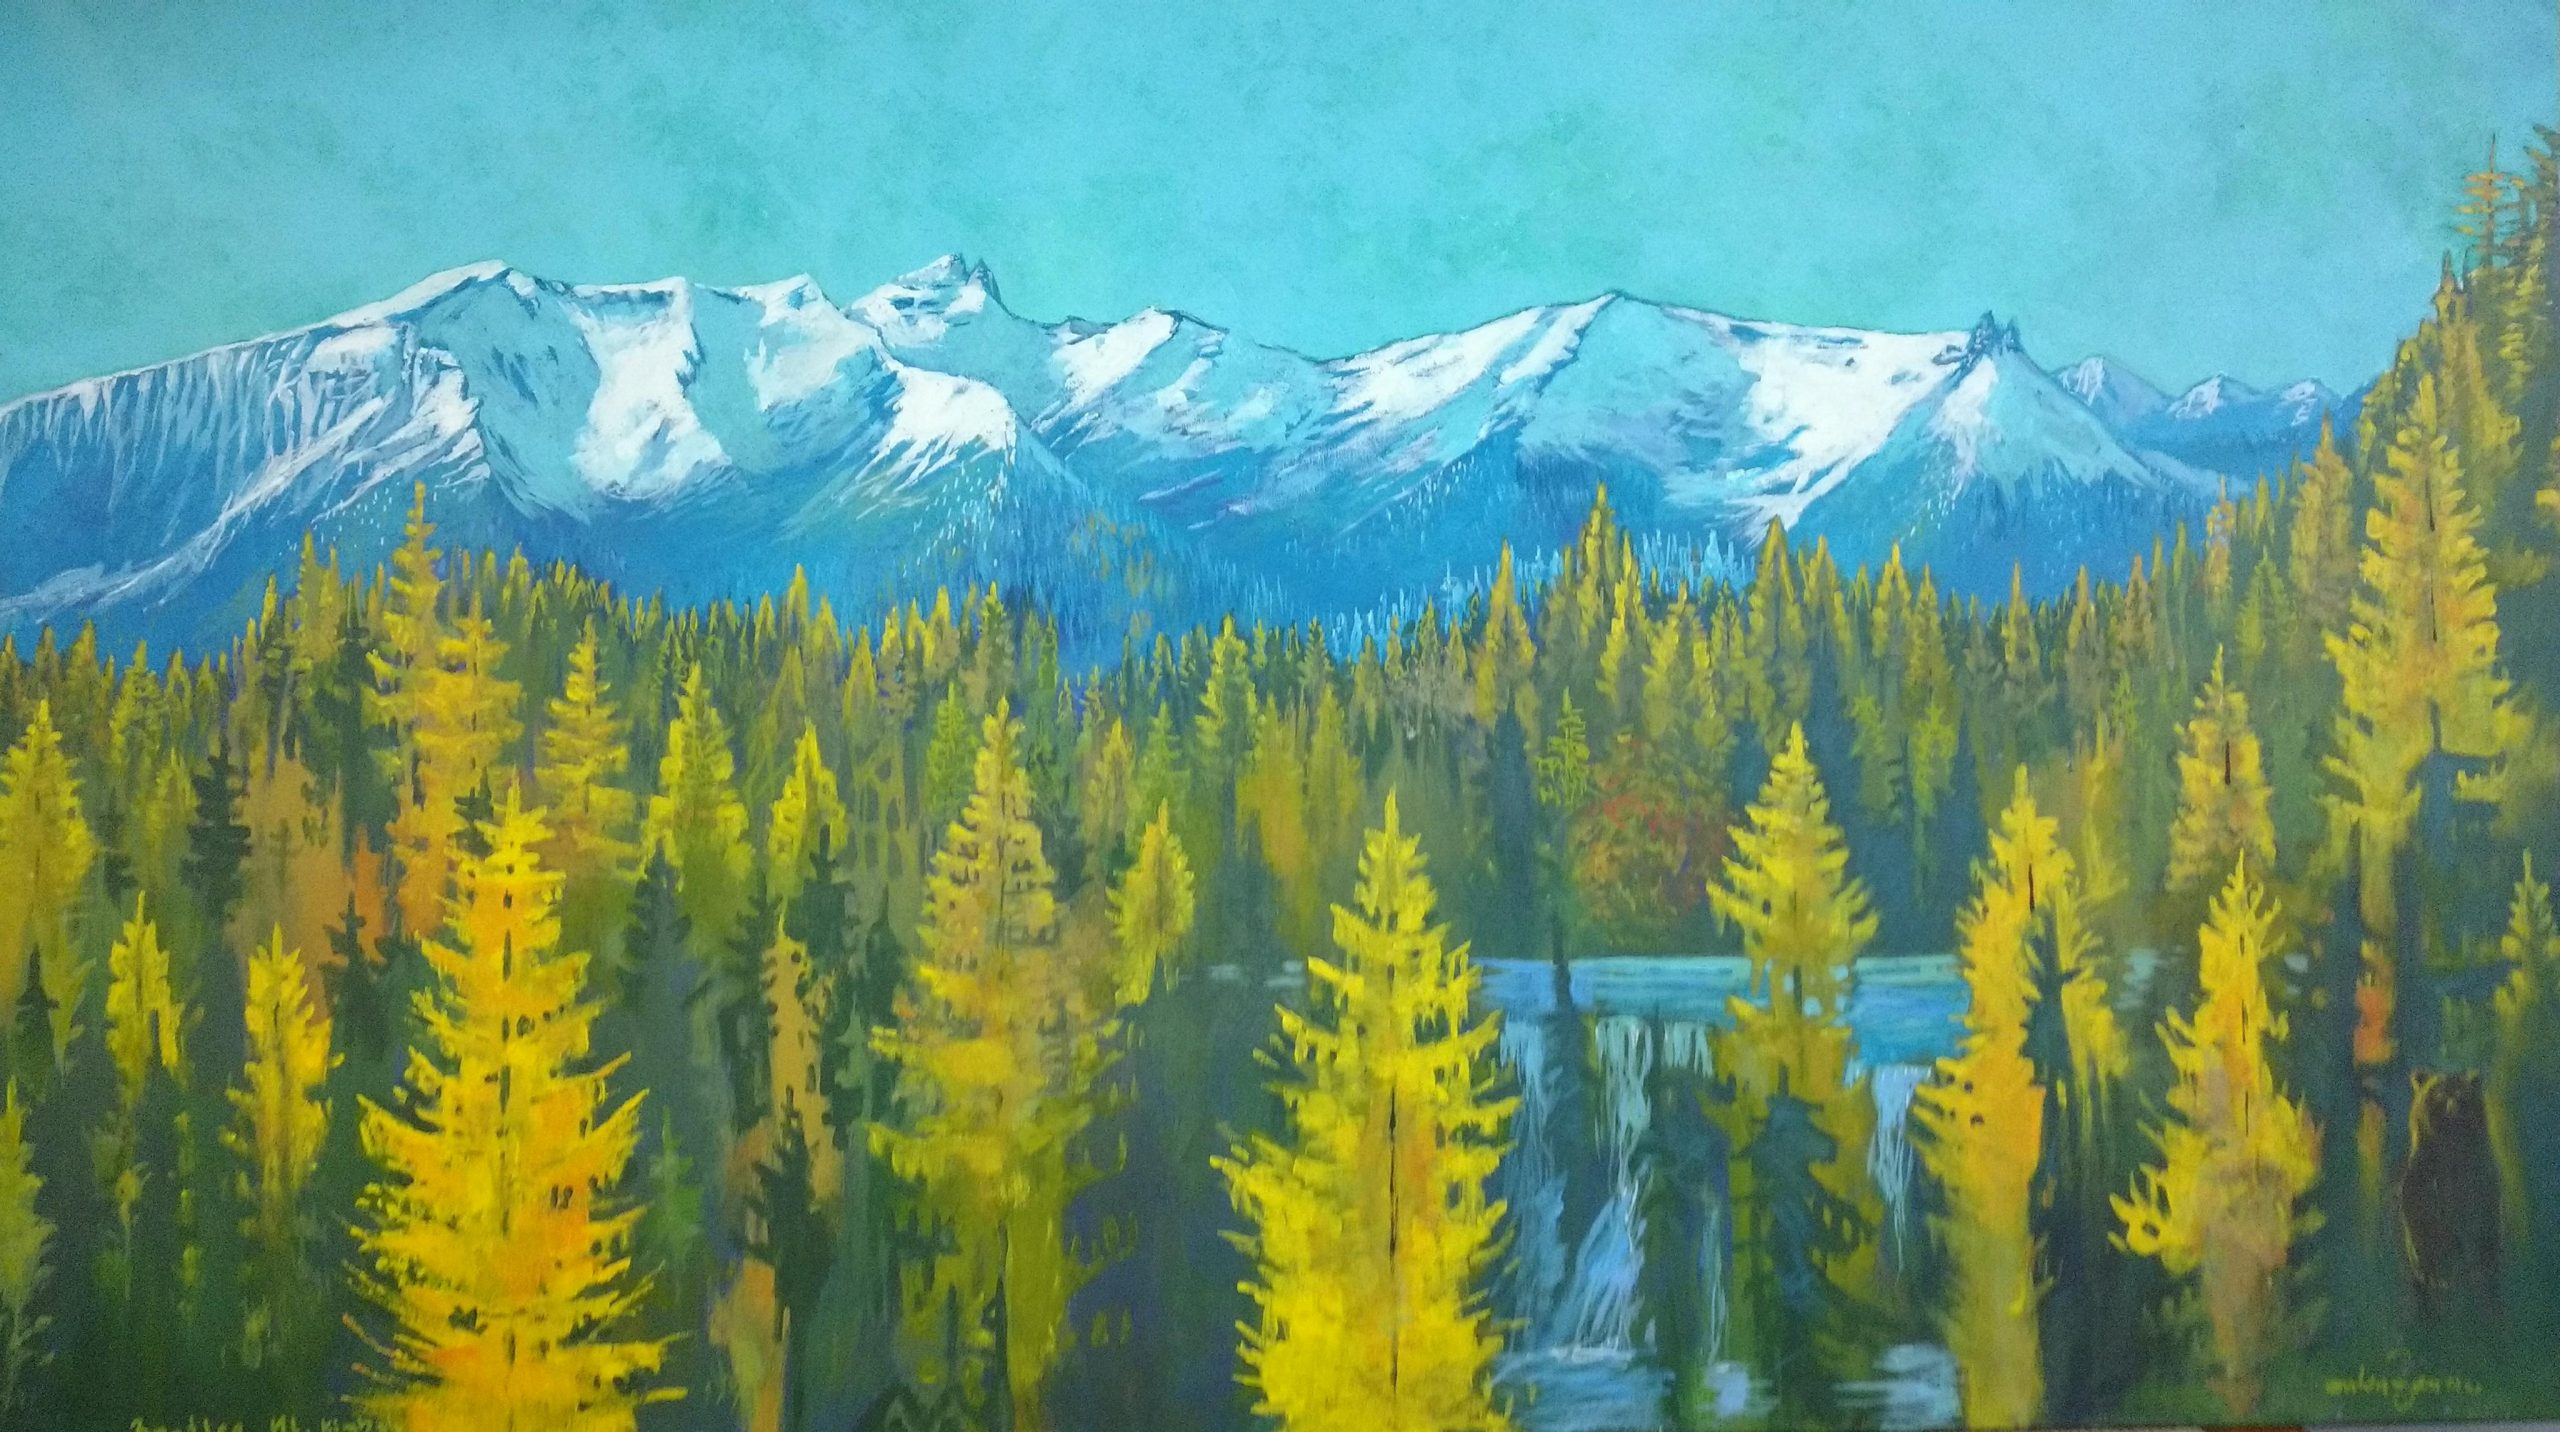 Kimberley artist wants Bootleg Mountain included in city's branding